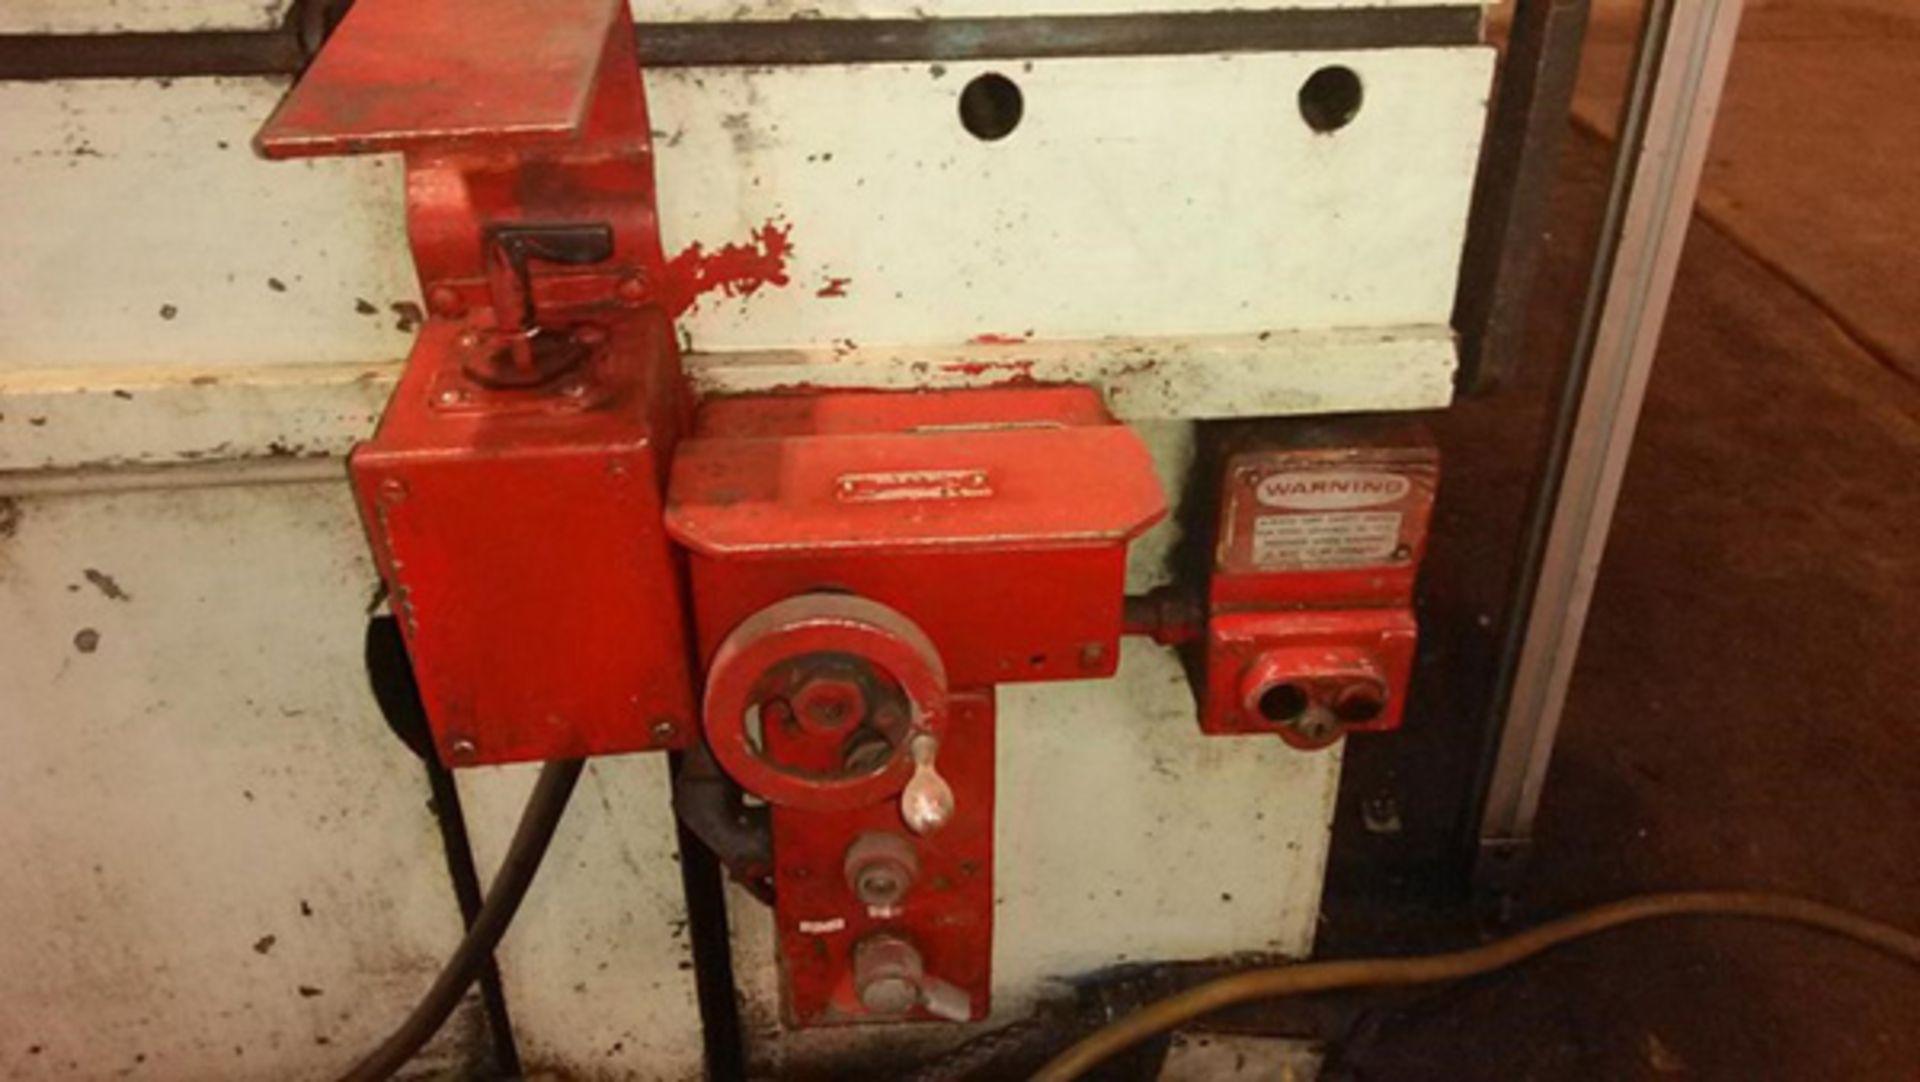 Lot 35A - Cincinnati Hydraulic Press Brake | 500 Ton x 20', Mdl: 500H, S/N: 37853 - 8276P